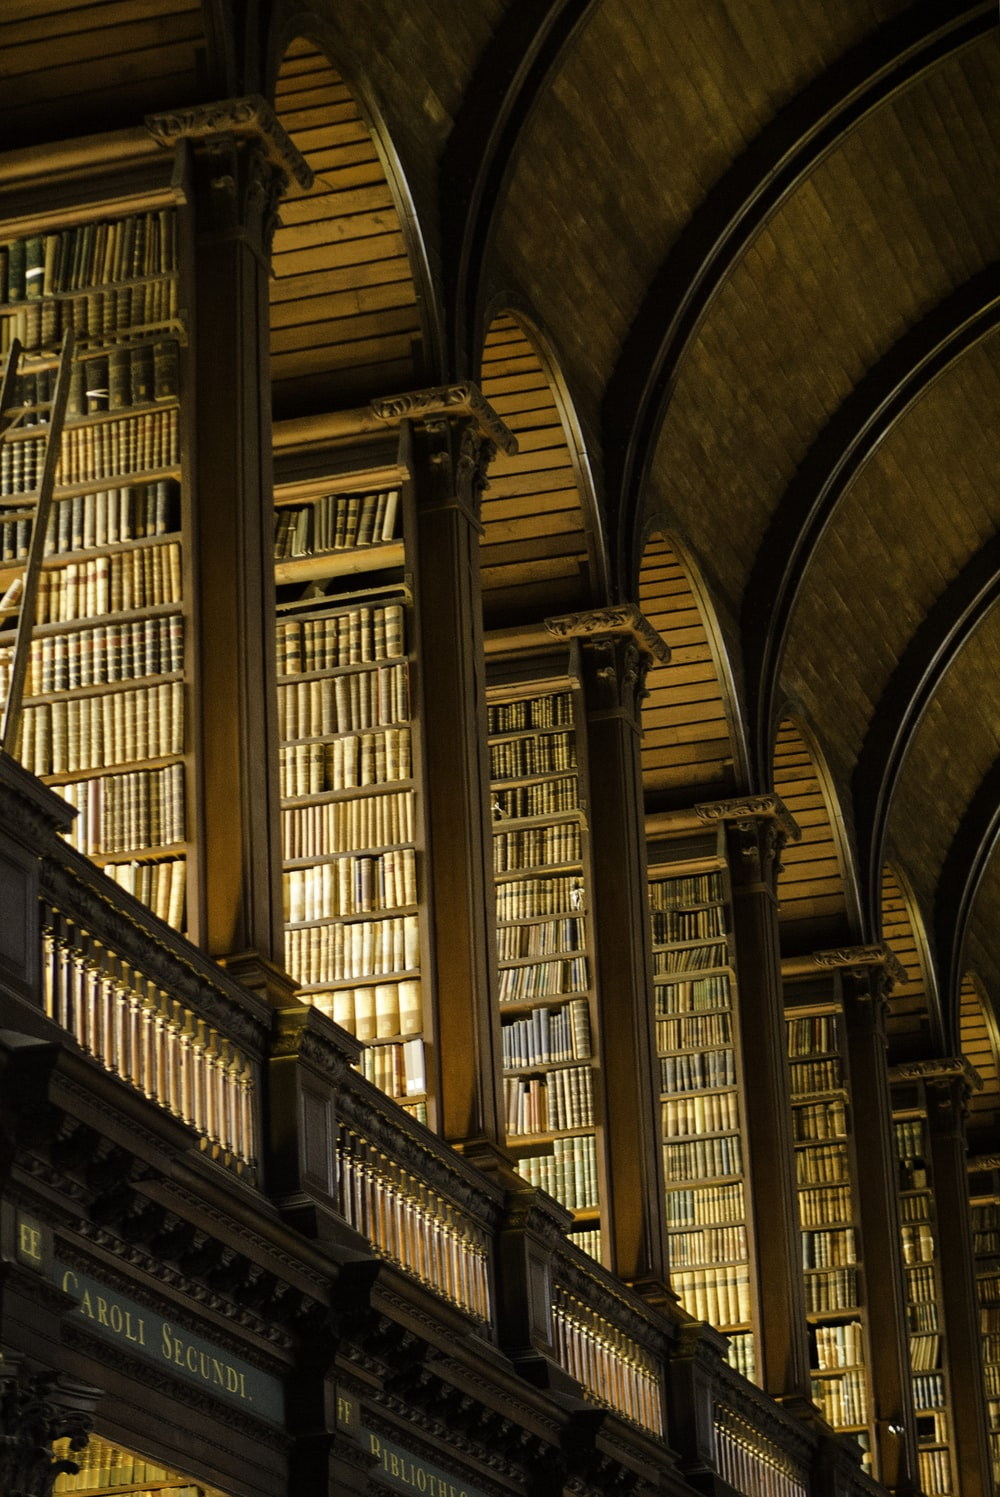 photo of bookshelf library